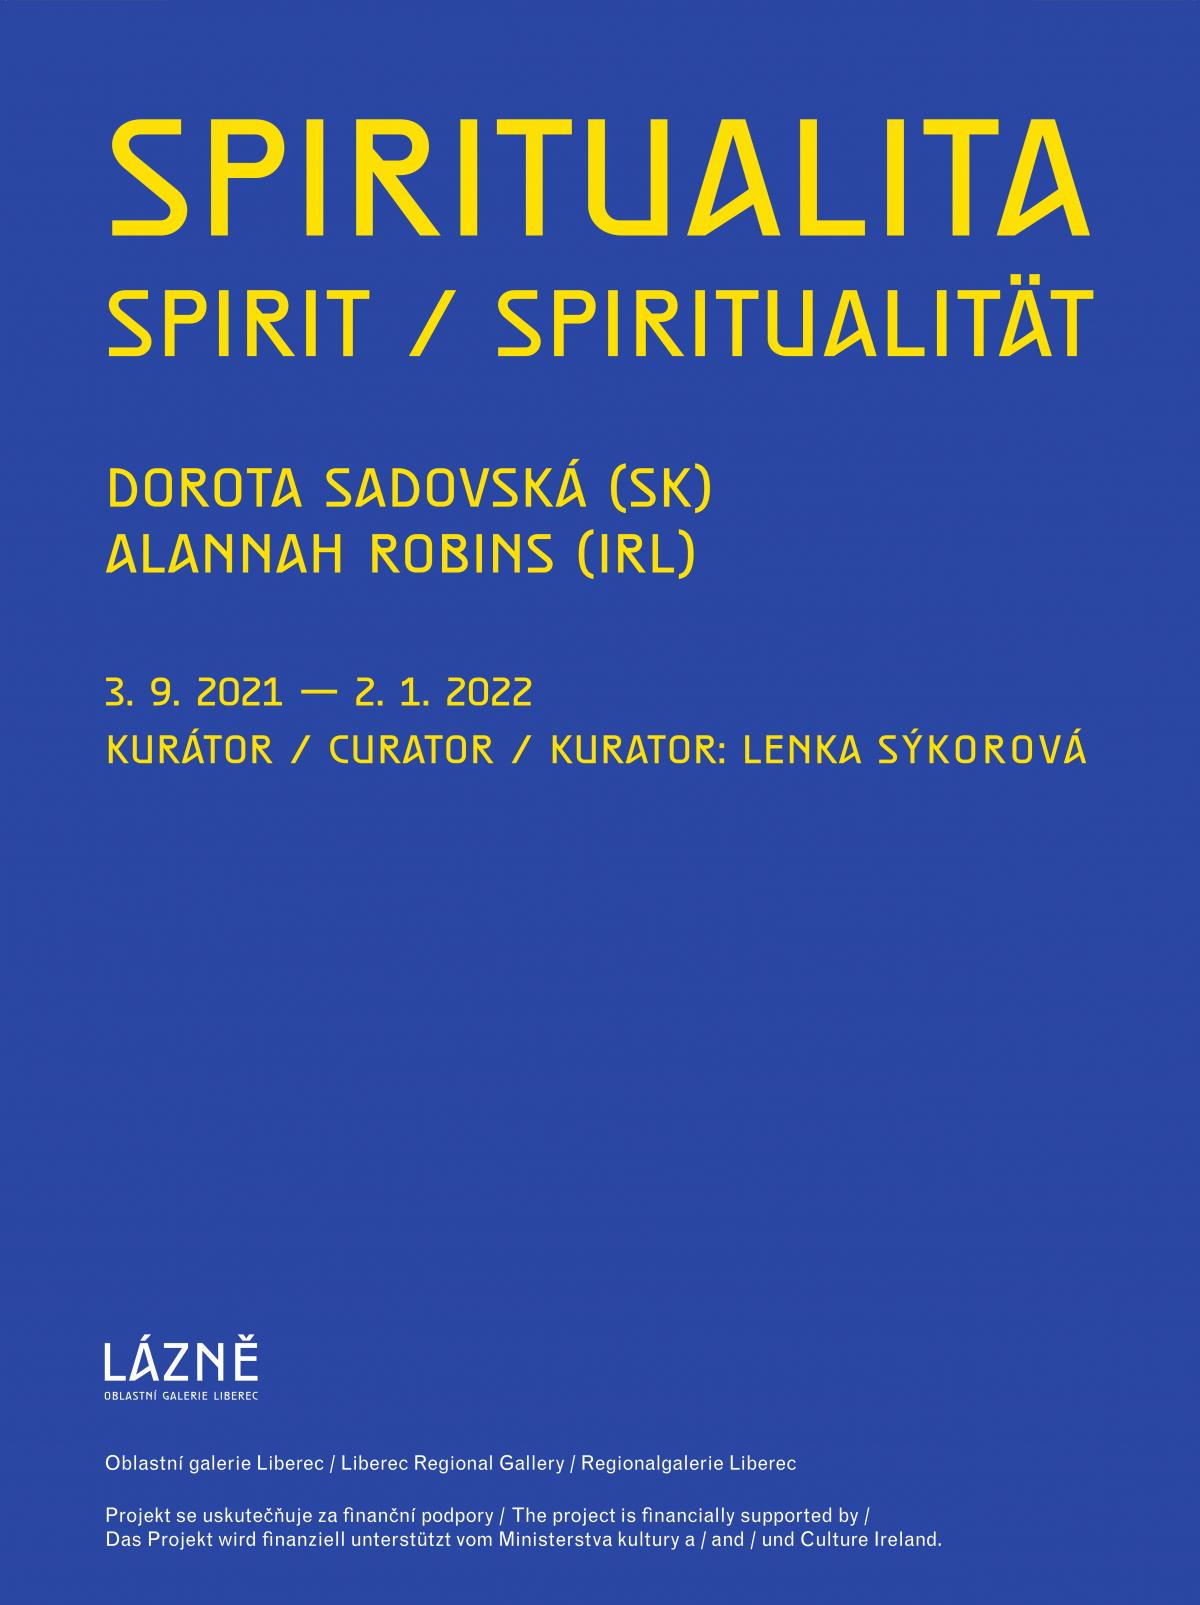 Dorota Sadovská /SK/, Alannah Robins /IRL/